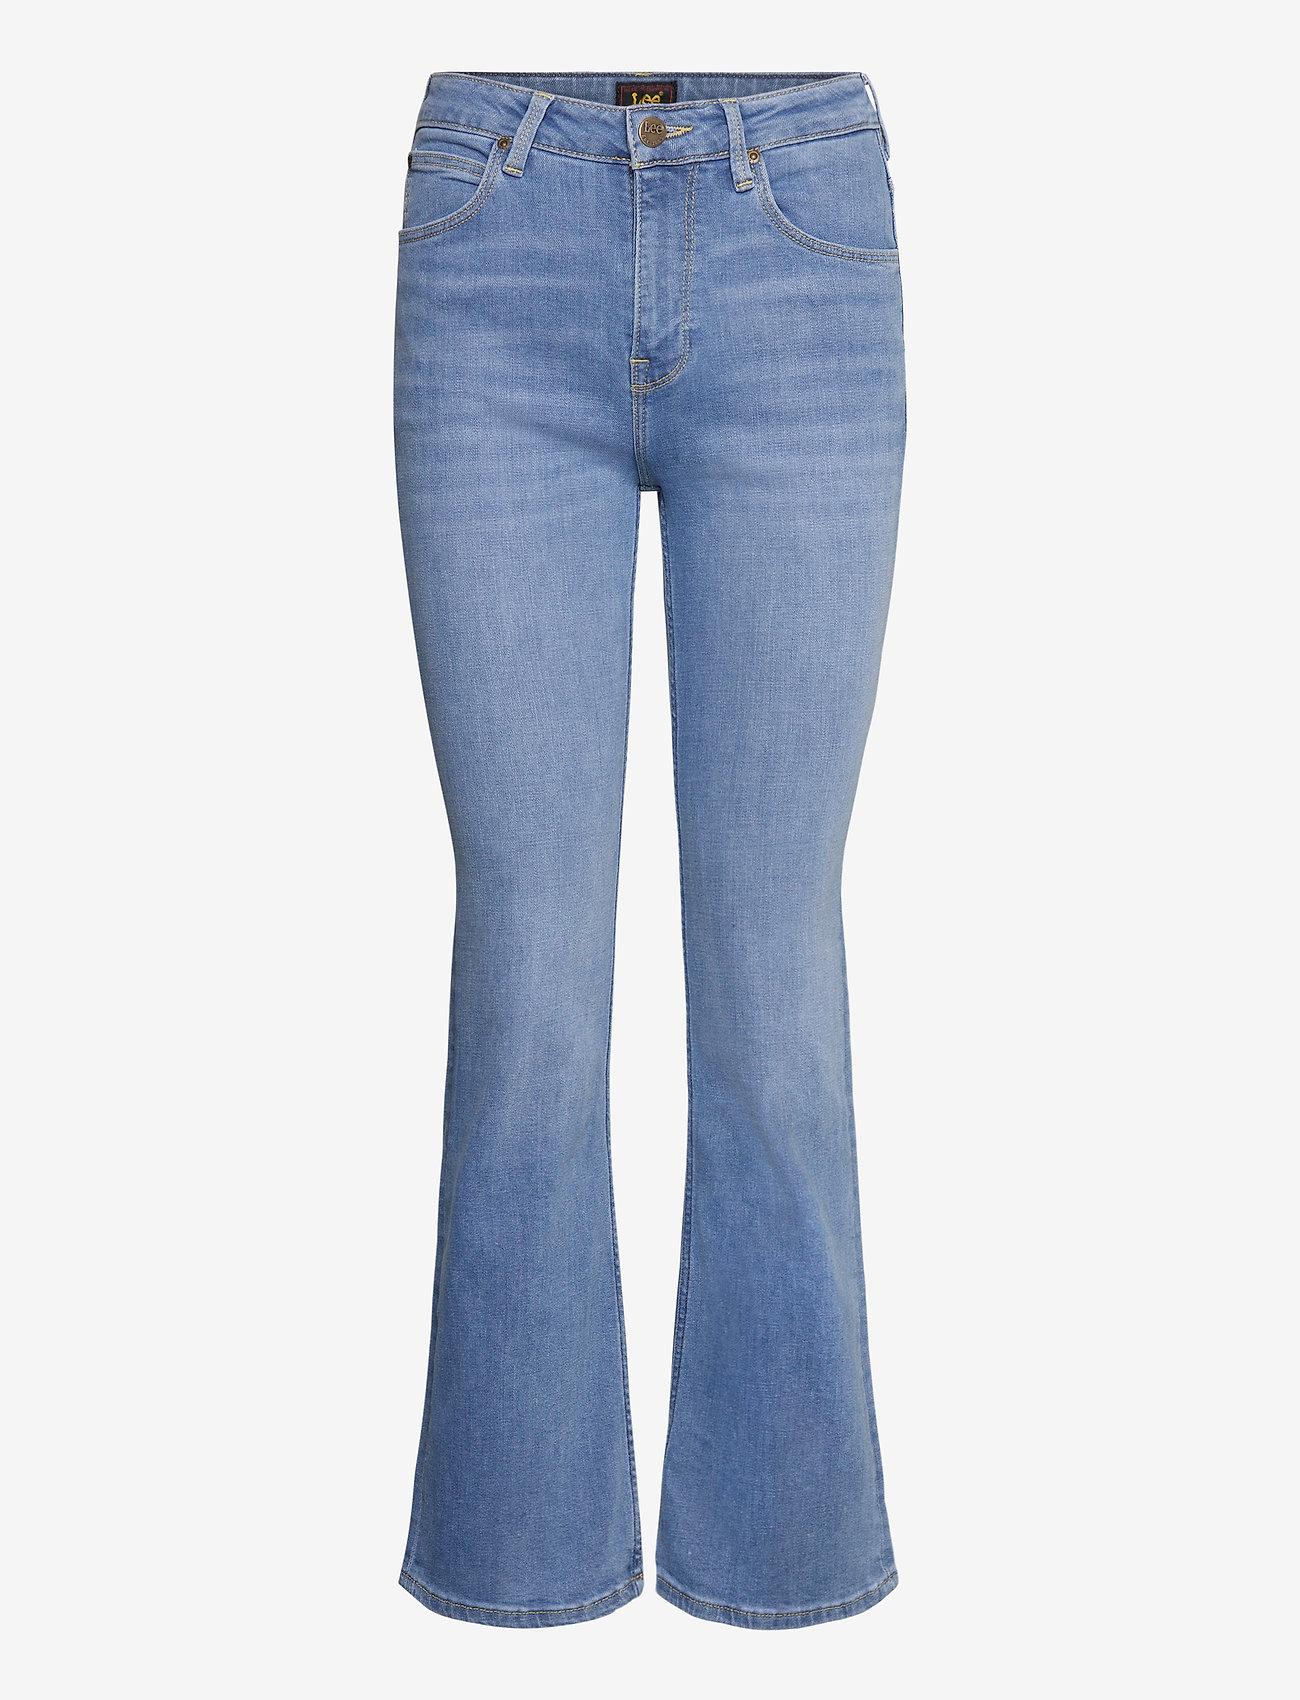 Lee Jeans - BREESE BOOT - schlaghosen - light lou - 0